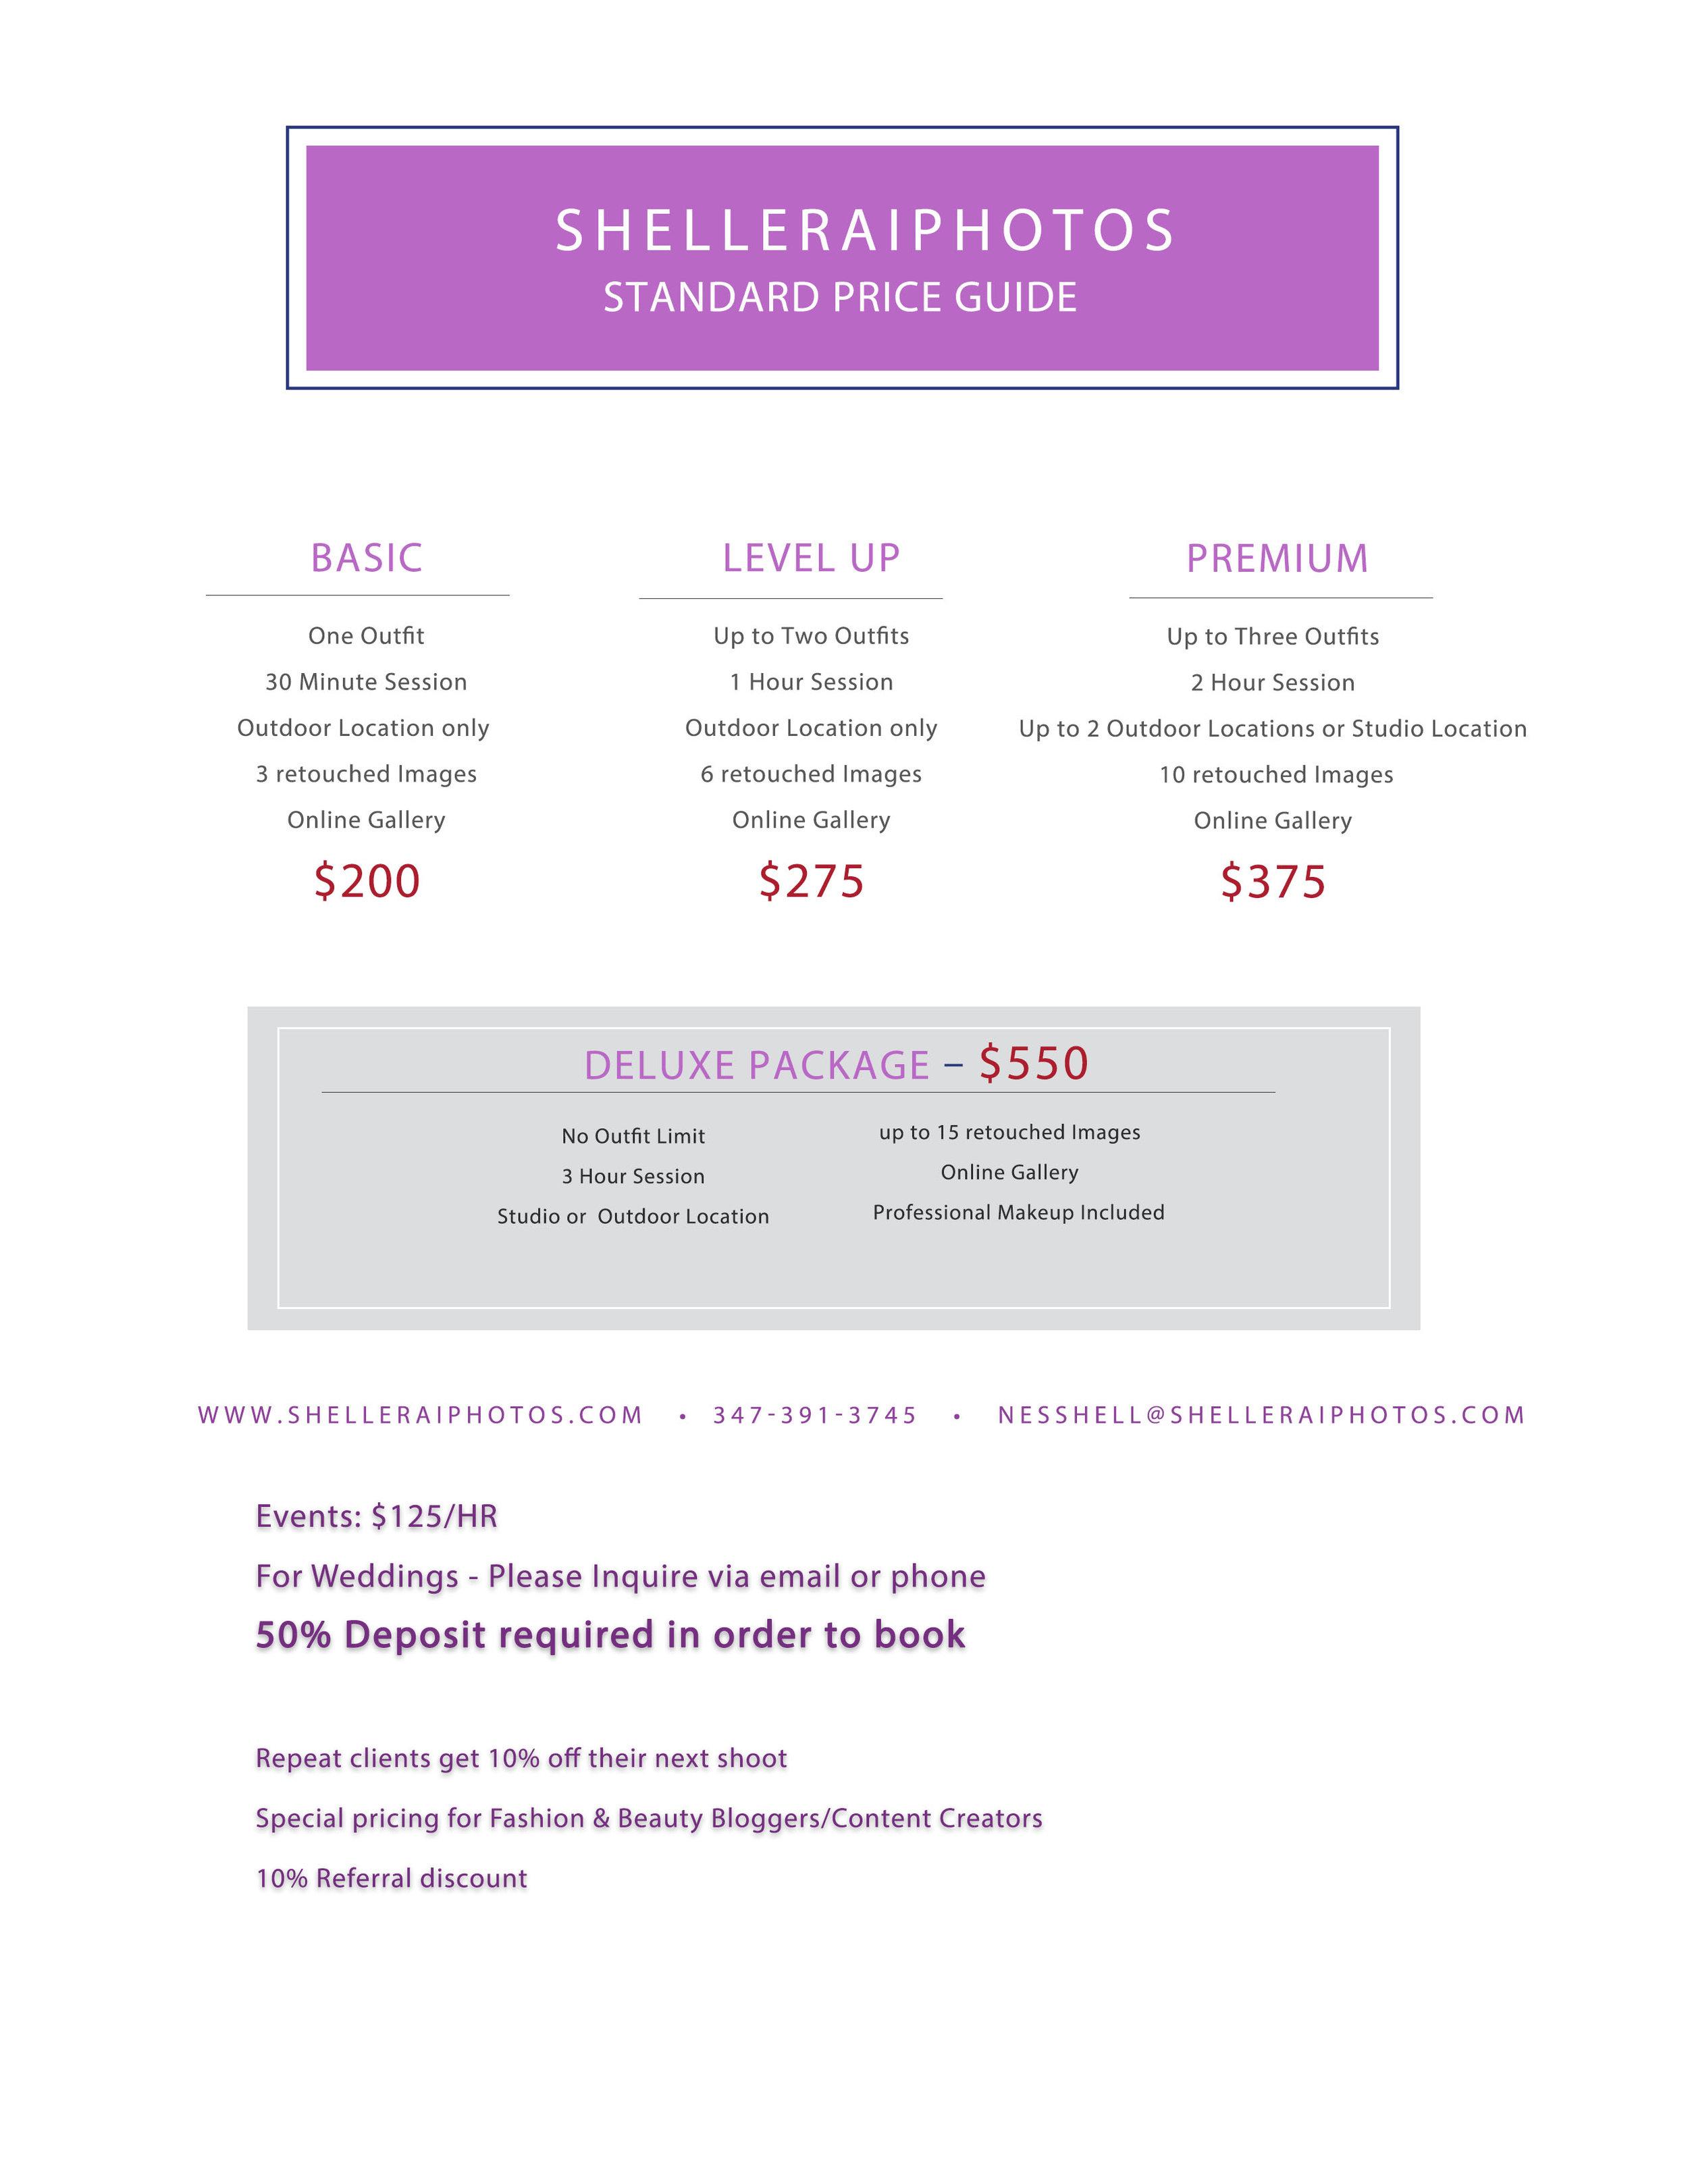 Price Guide-Template1-Fin.jpg